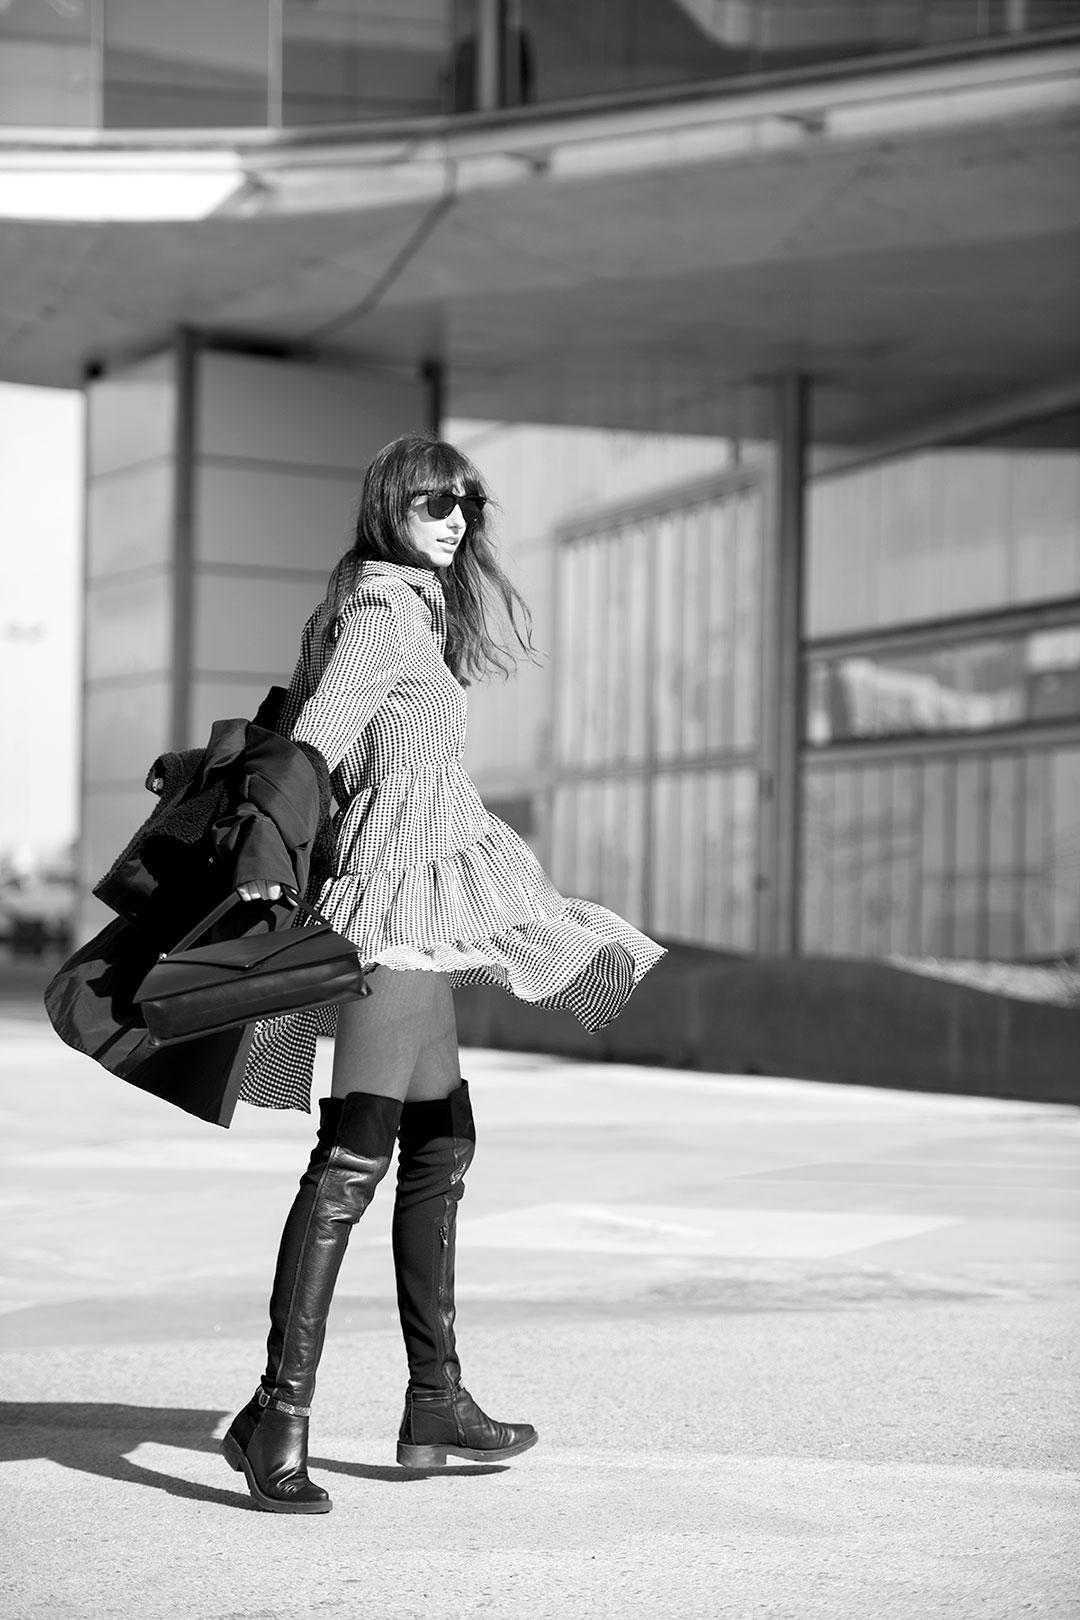 mbfwm-black-and-white-street-style-mitmeblog-bn-web-17